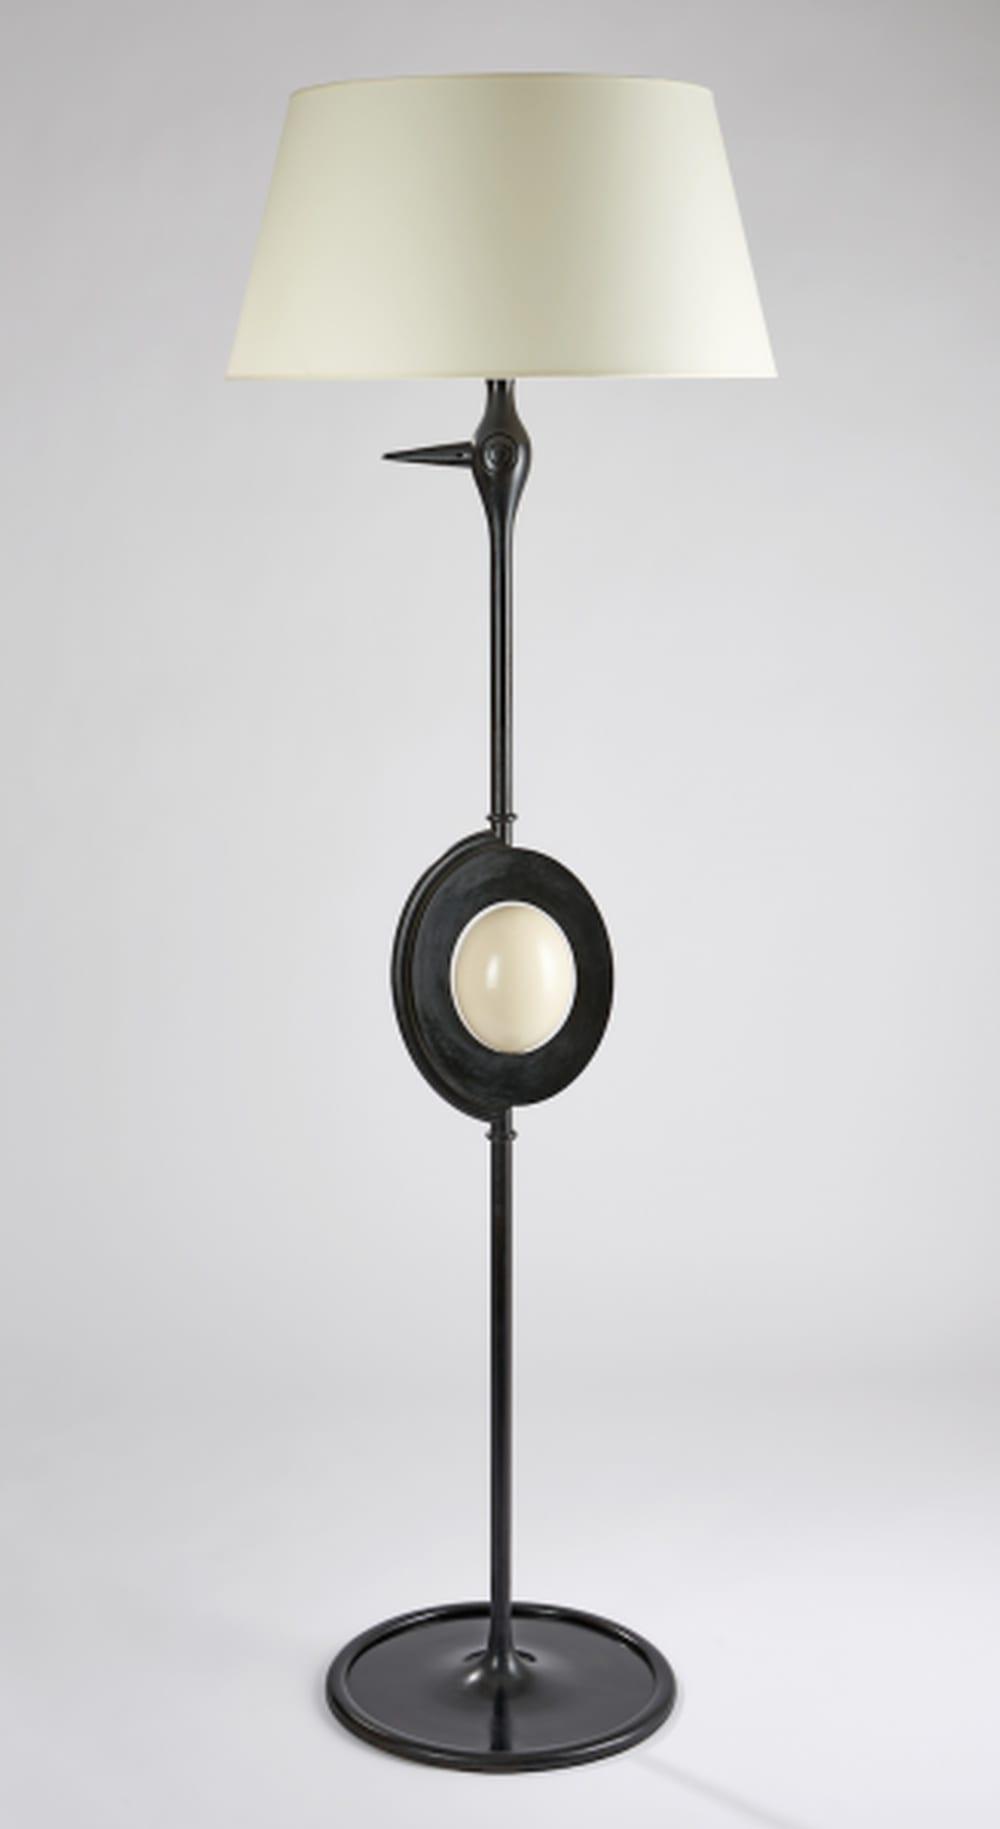 Hubert Le Gall, Ostrich Lamp, 2016